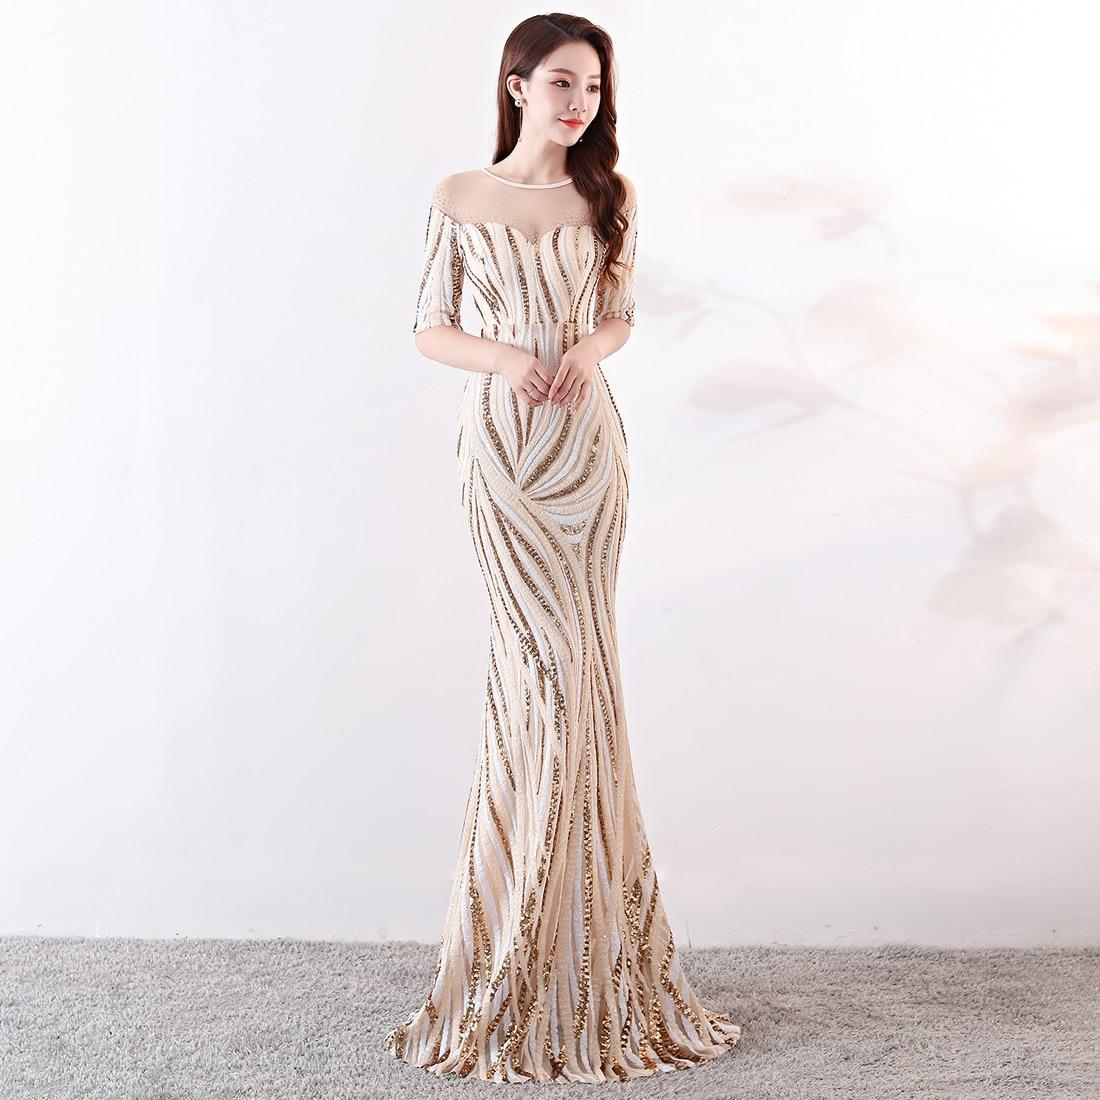 Sexy rayé Sequin robe élégante perles soirée robe de soirée longue femmes Mermain robe noir maille dos nu robe d'été 2019